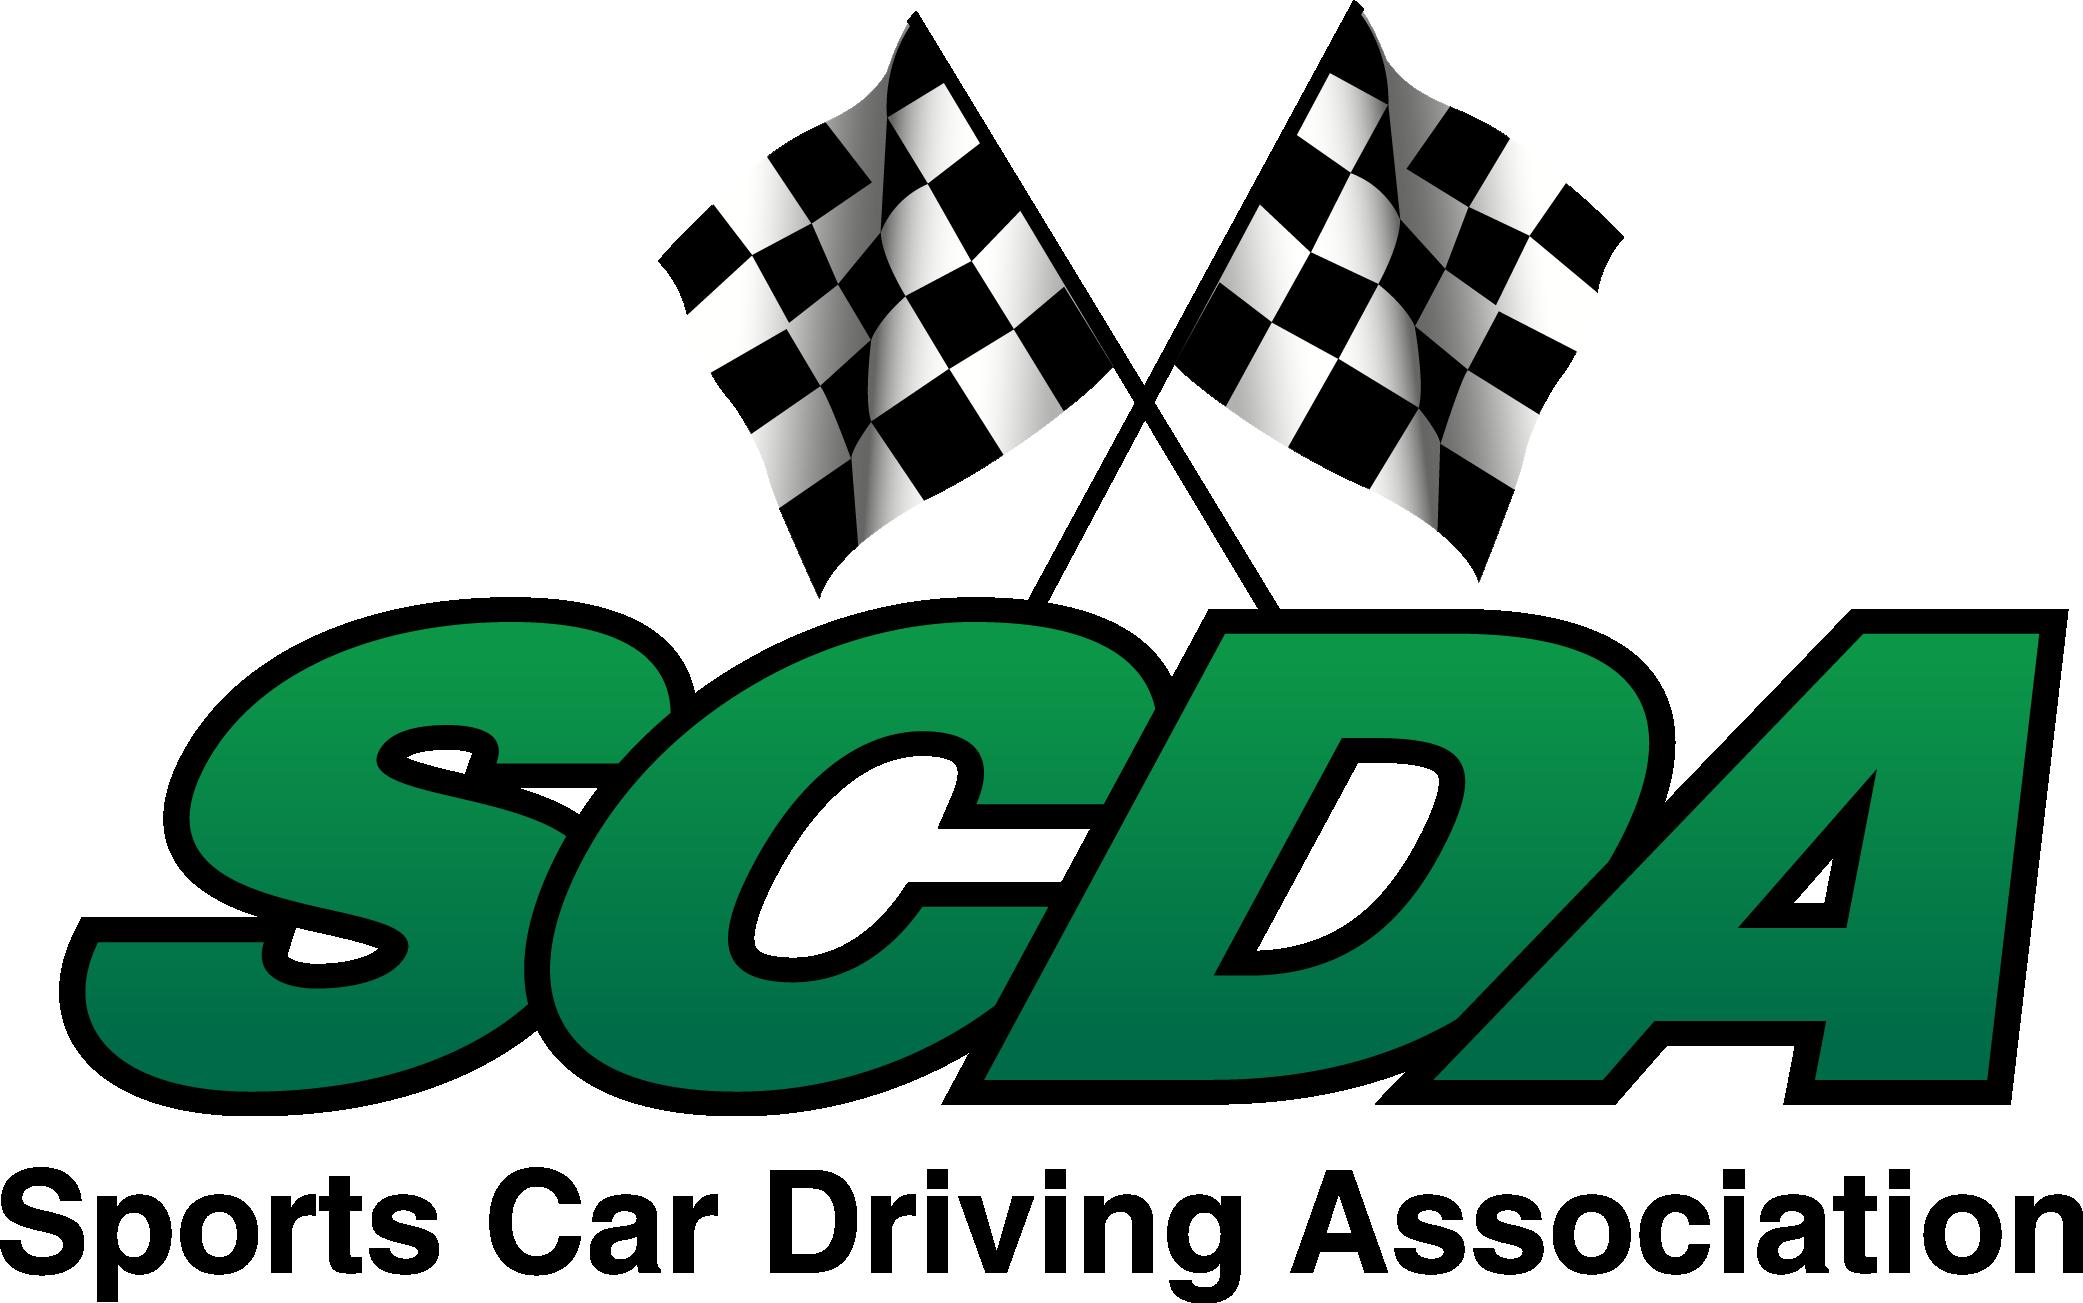 sports-car-driving-association-logo-black.png